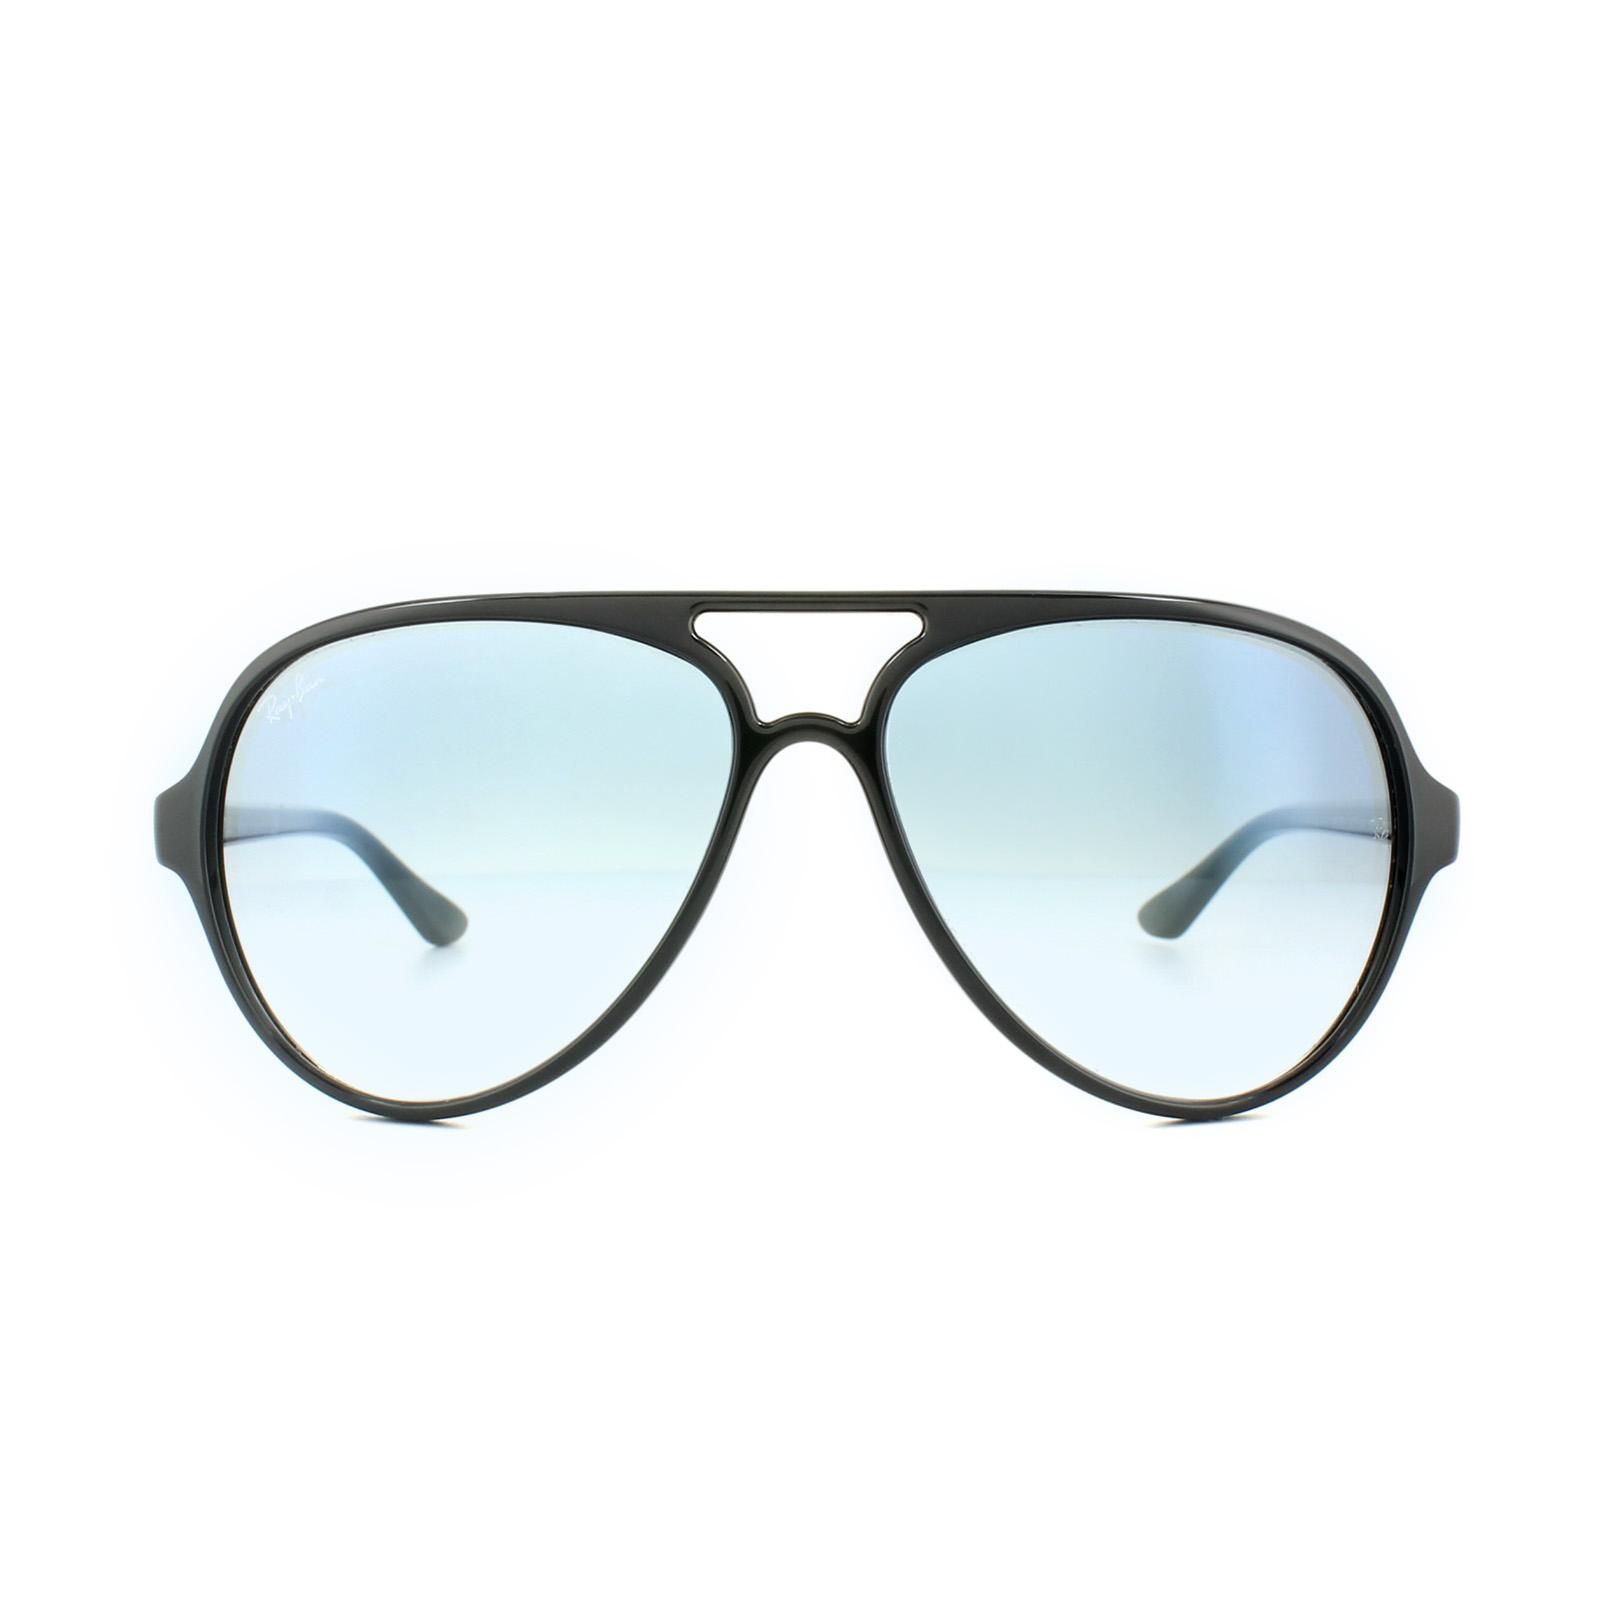 f60064596054c Sentinel Ray-Ban Sunglasses Cats 5000 4125 601 3F Black Light Blue Gradient